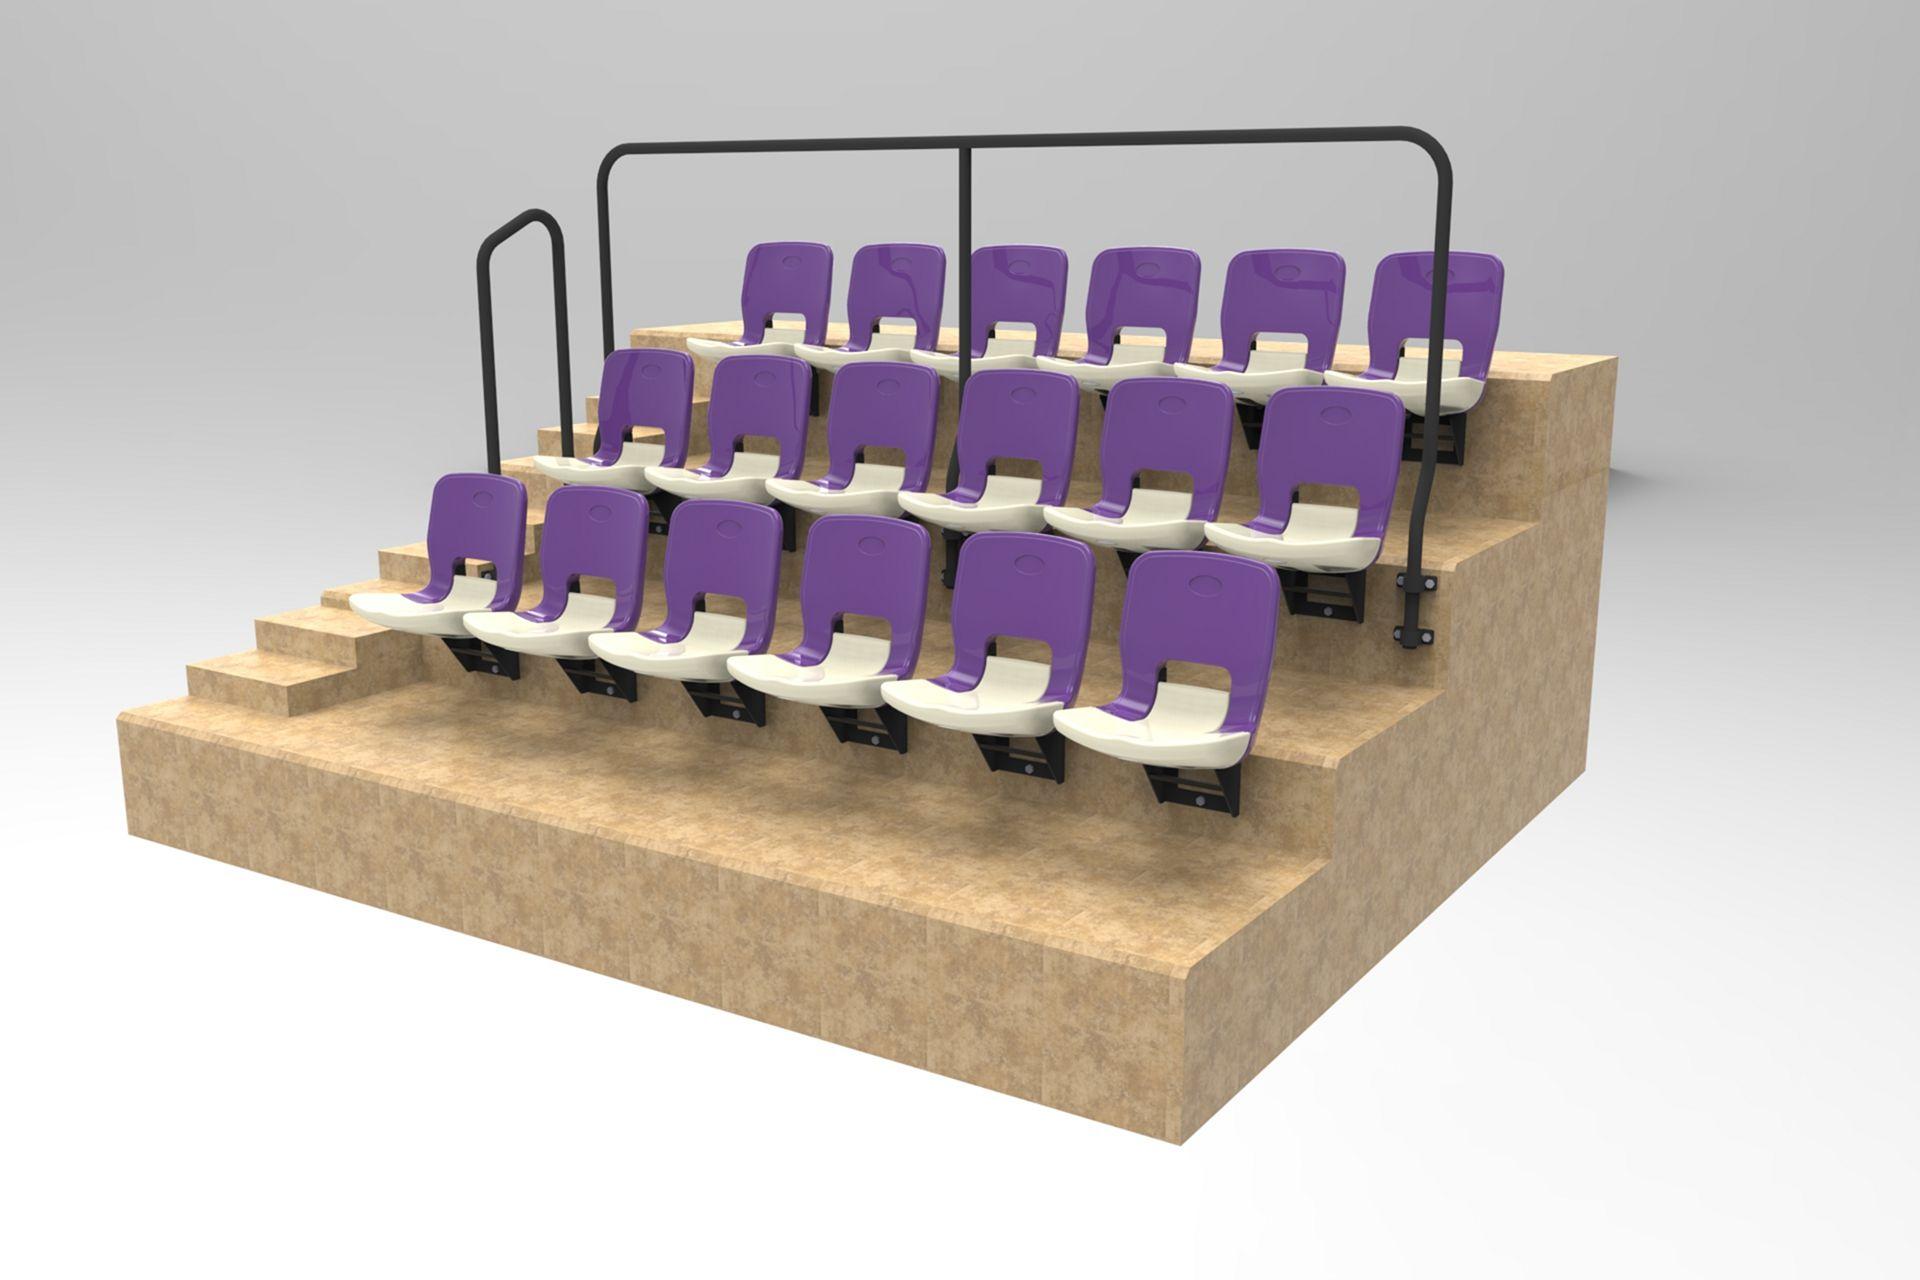 linea_backrest_monoblock_copolymer_pp_stadium_chair_seatorium_47